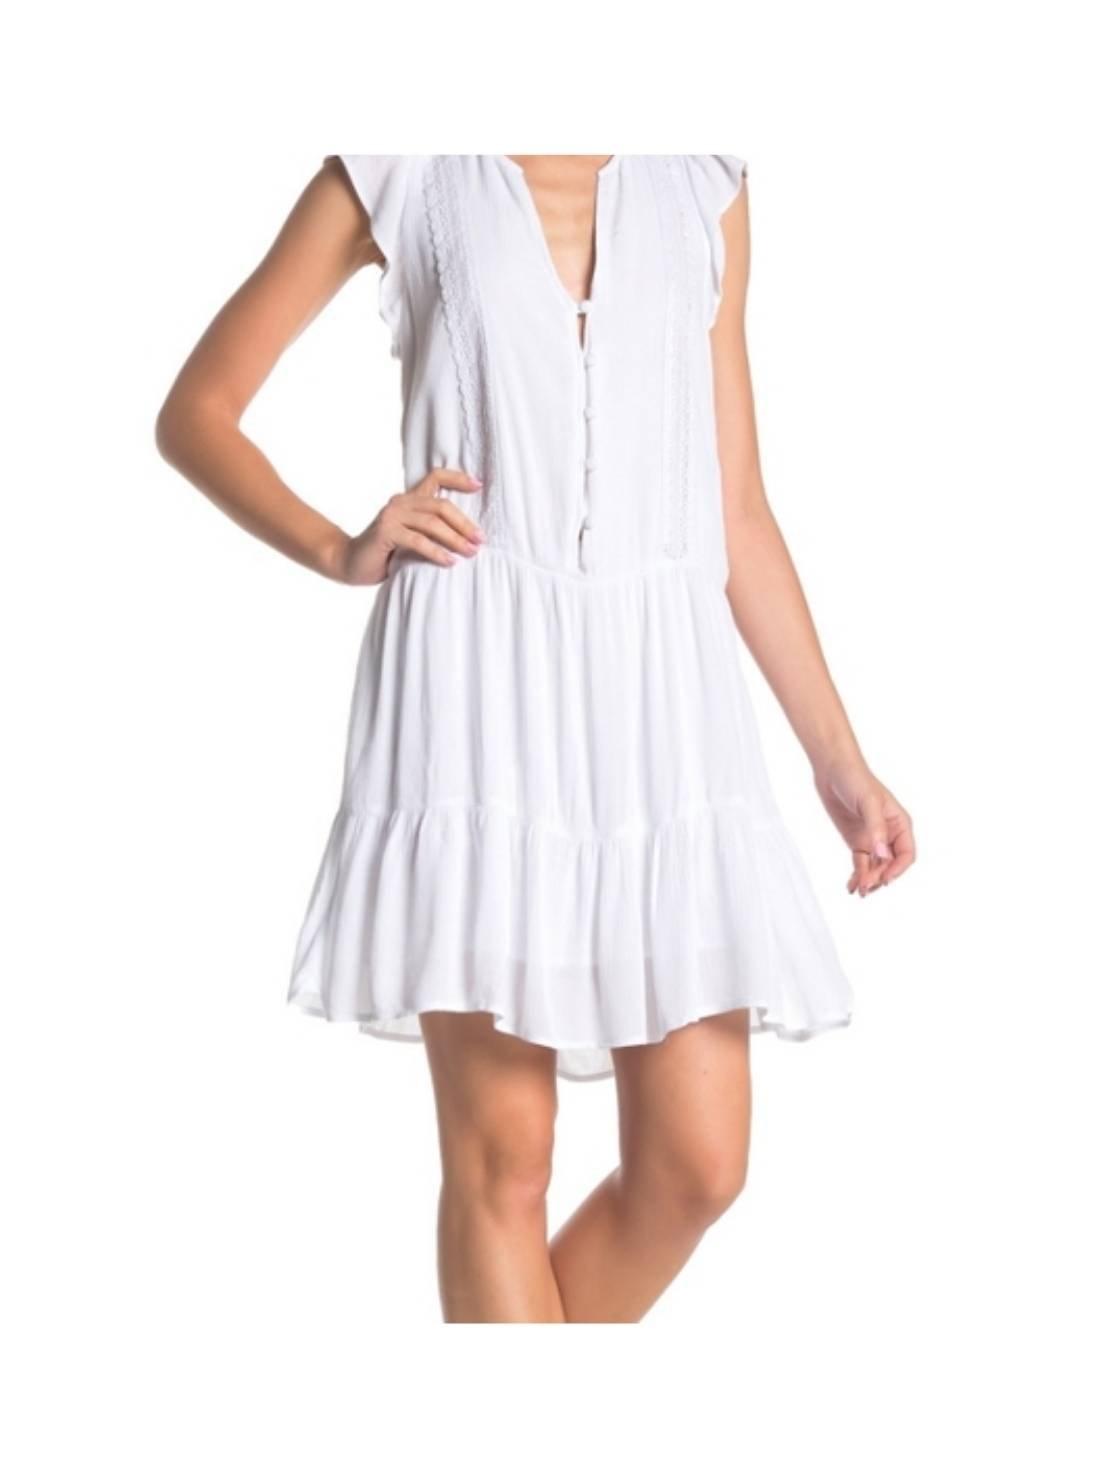 Tiered White Shift Dress